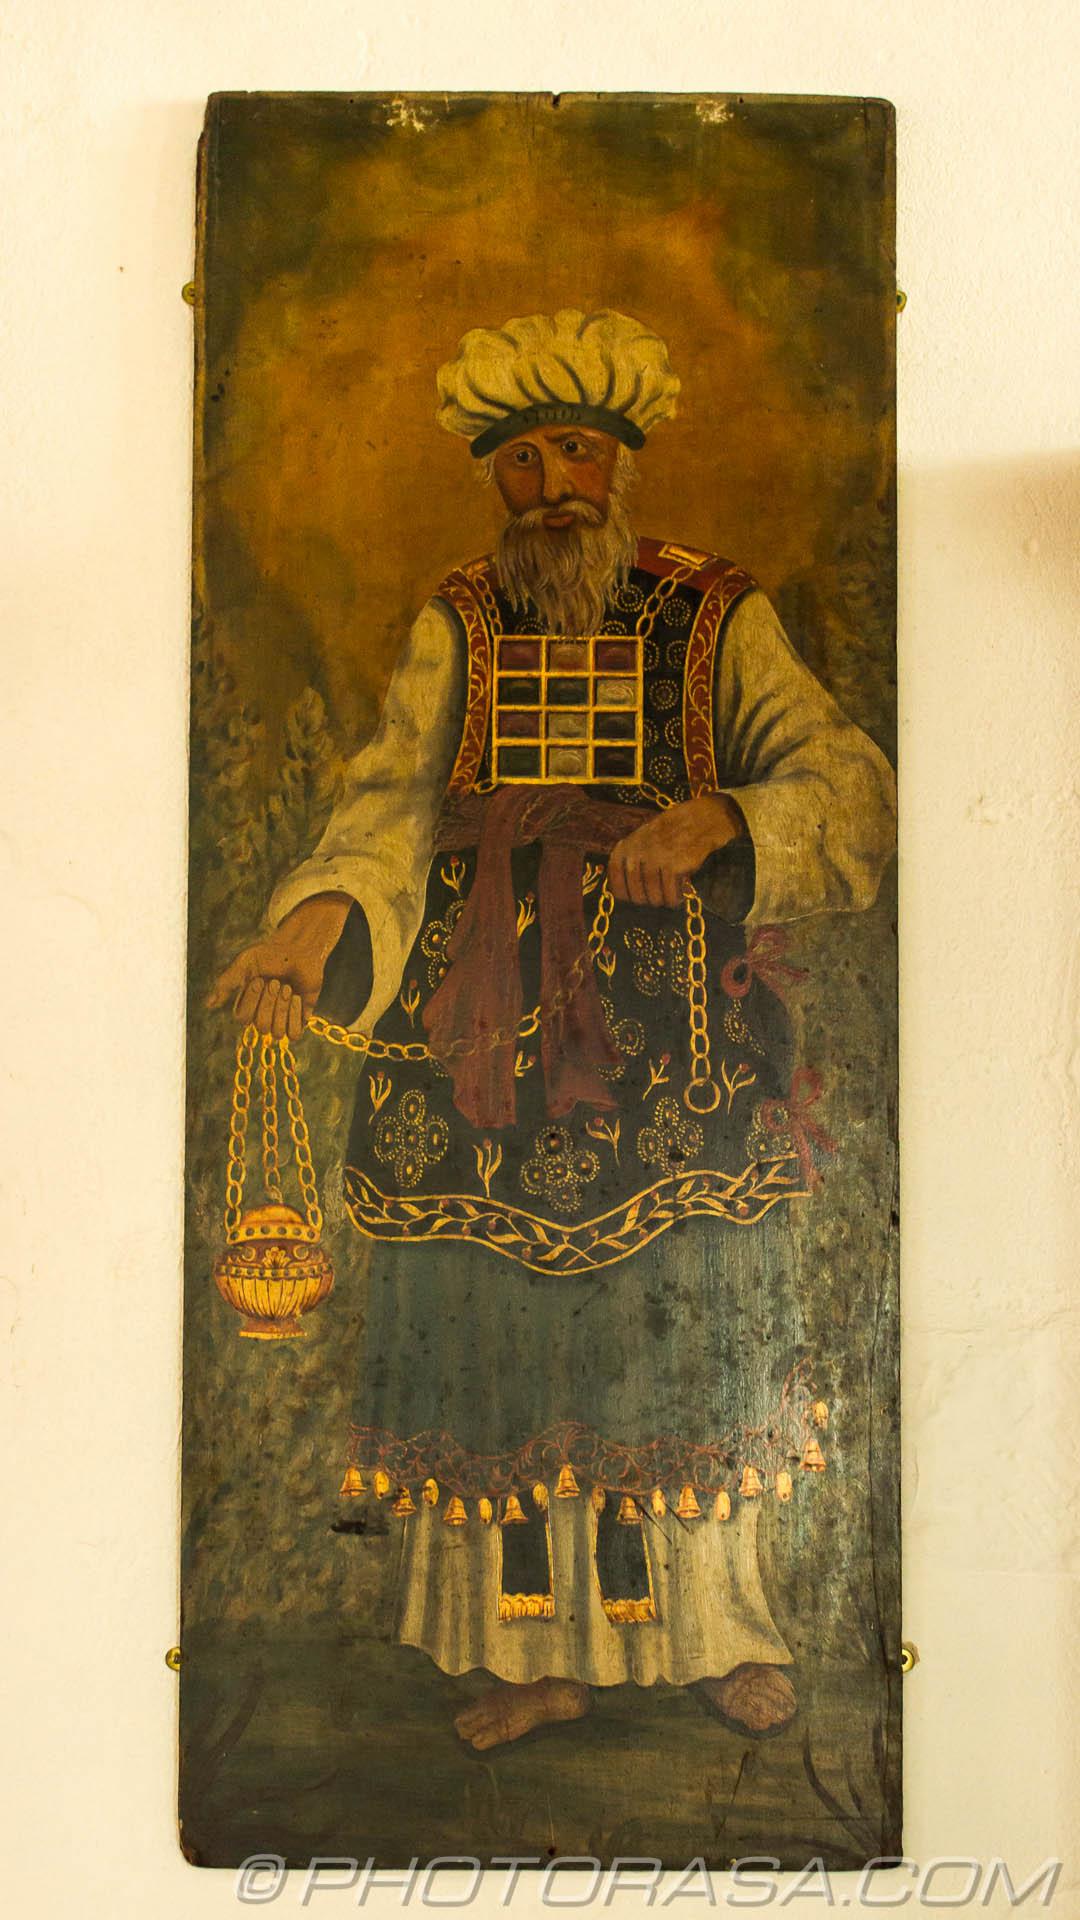 http://photorasa.com/parish-church-st-peter-st-paul-headcorn/17th-century-painted-panel-of-aaron/